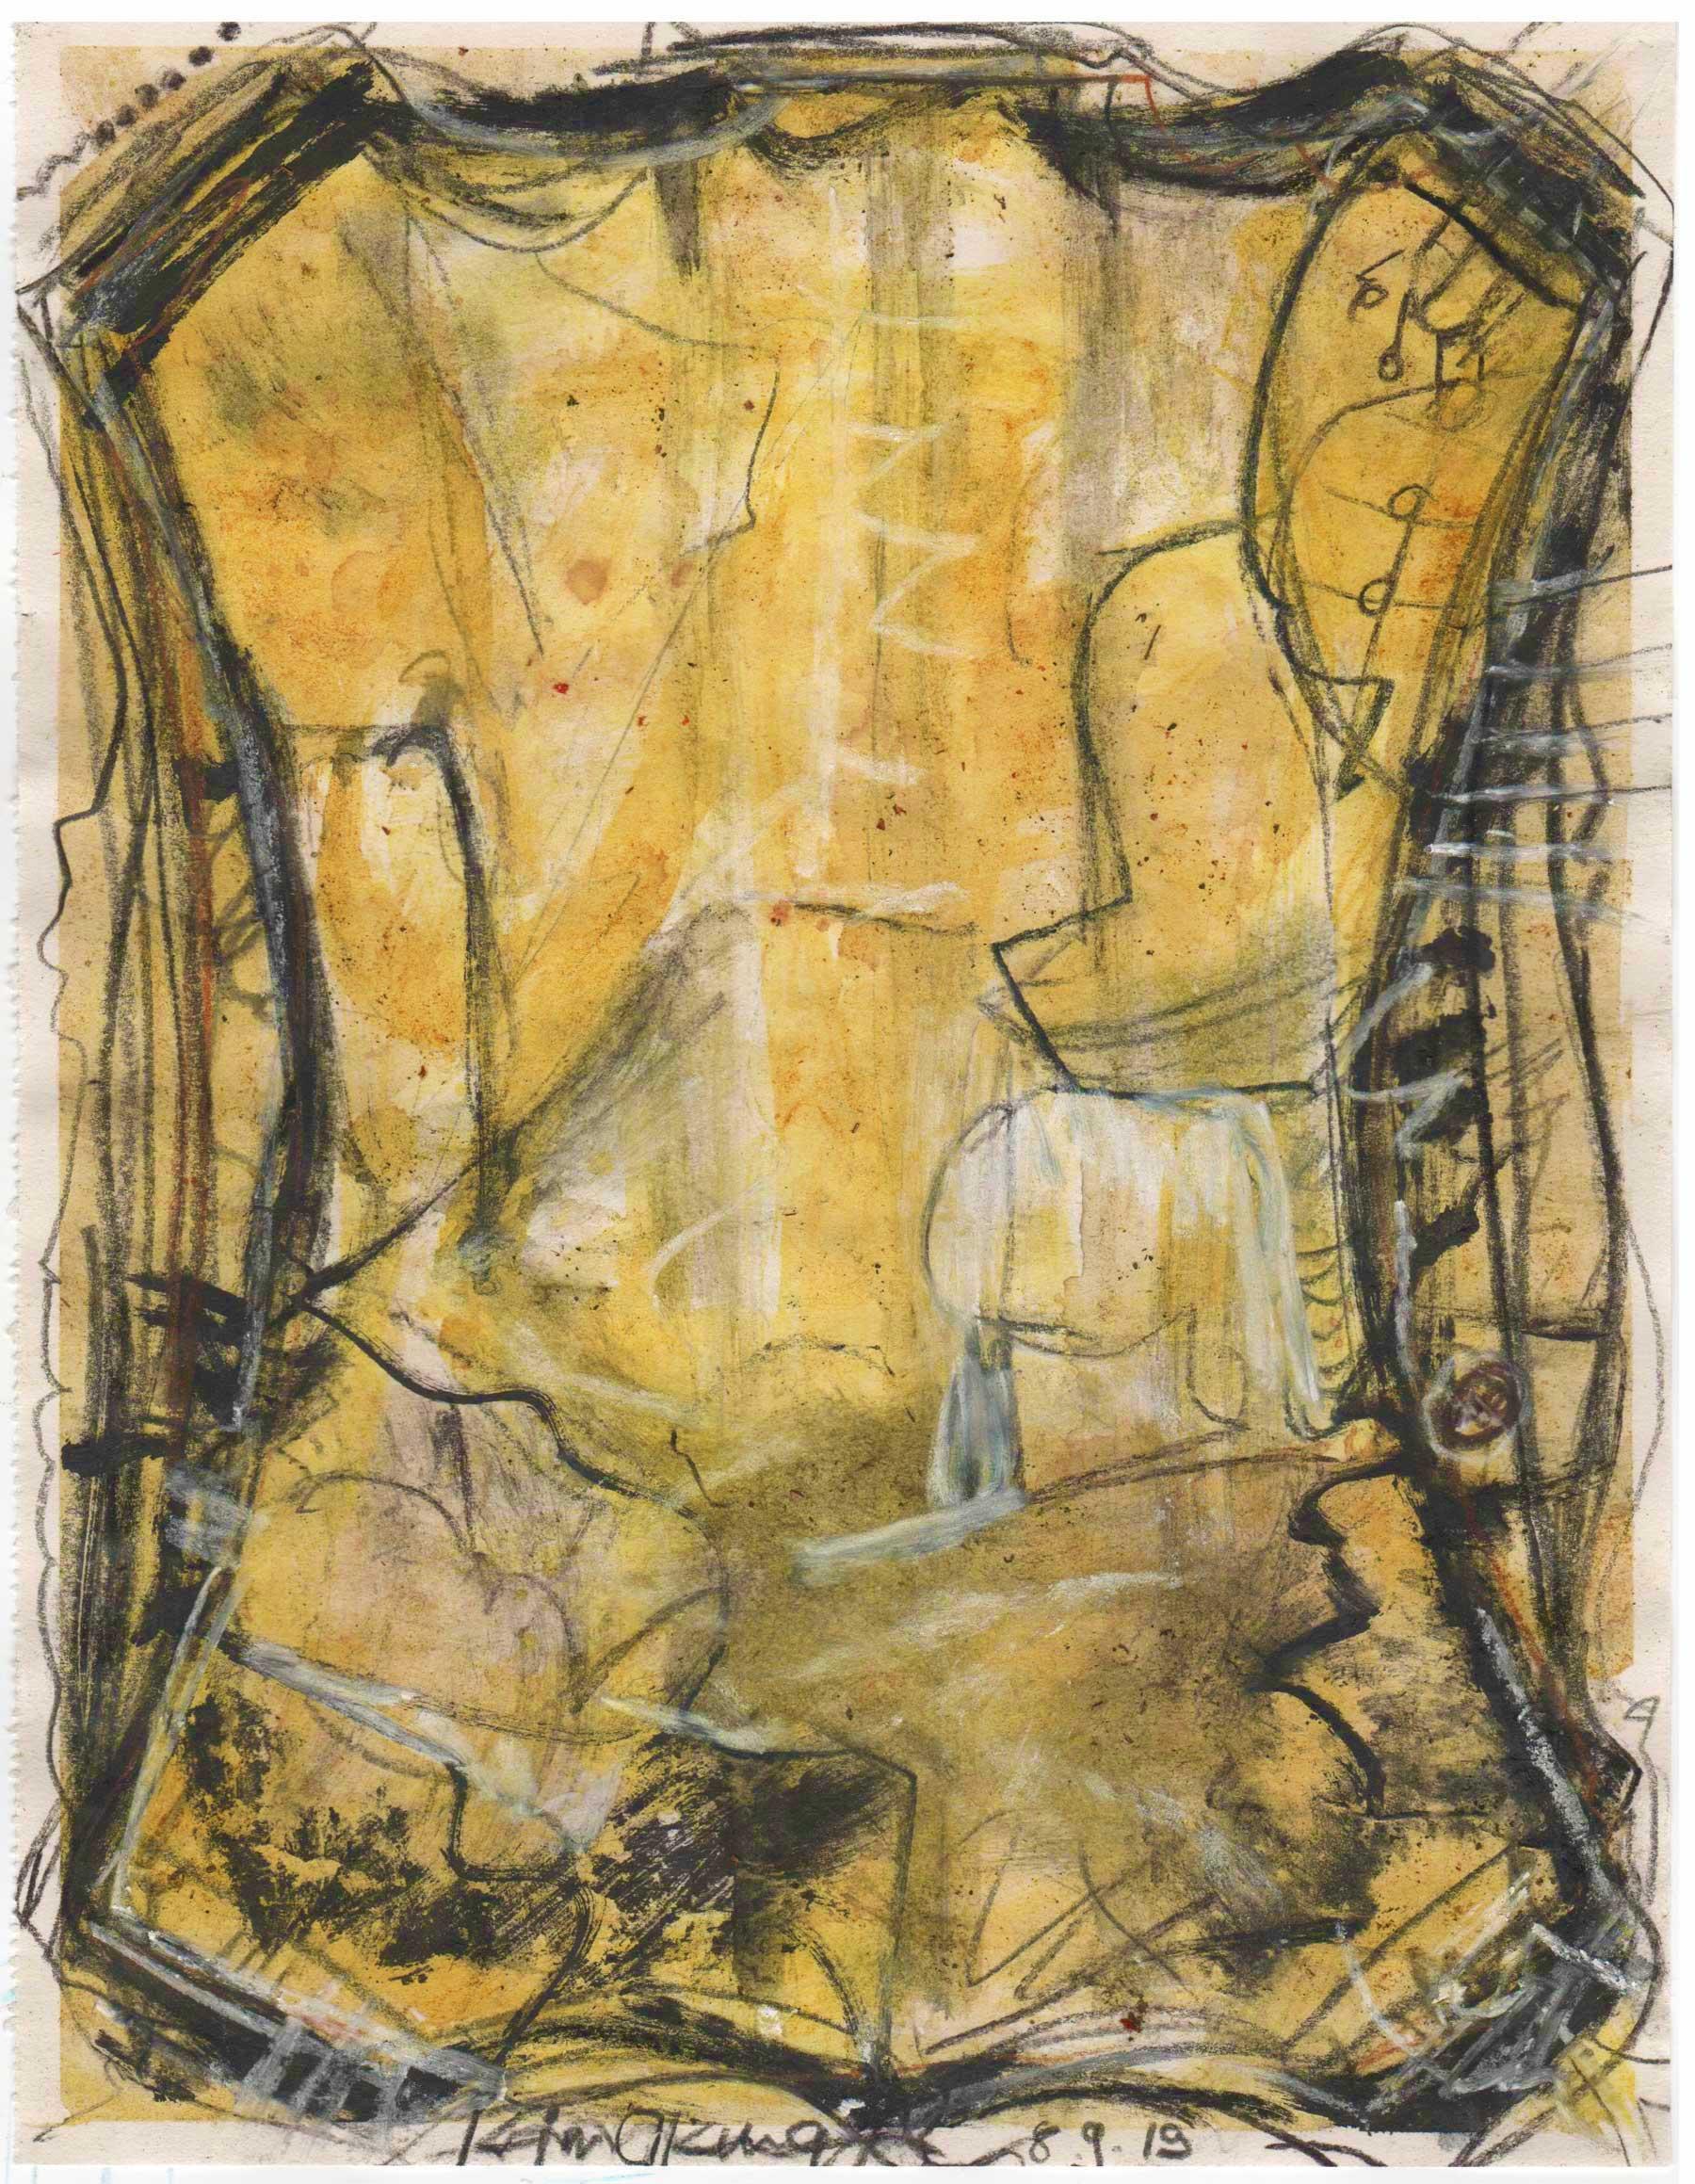 Kim Okura painting joytrophies